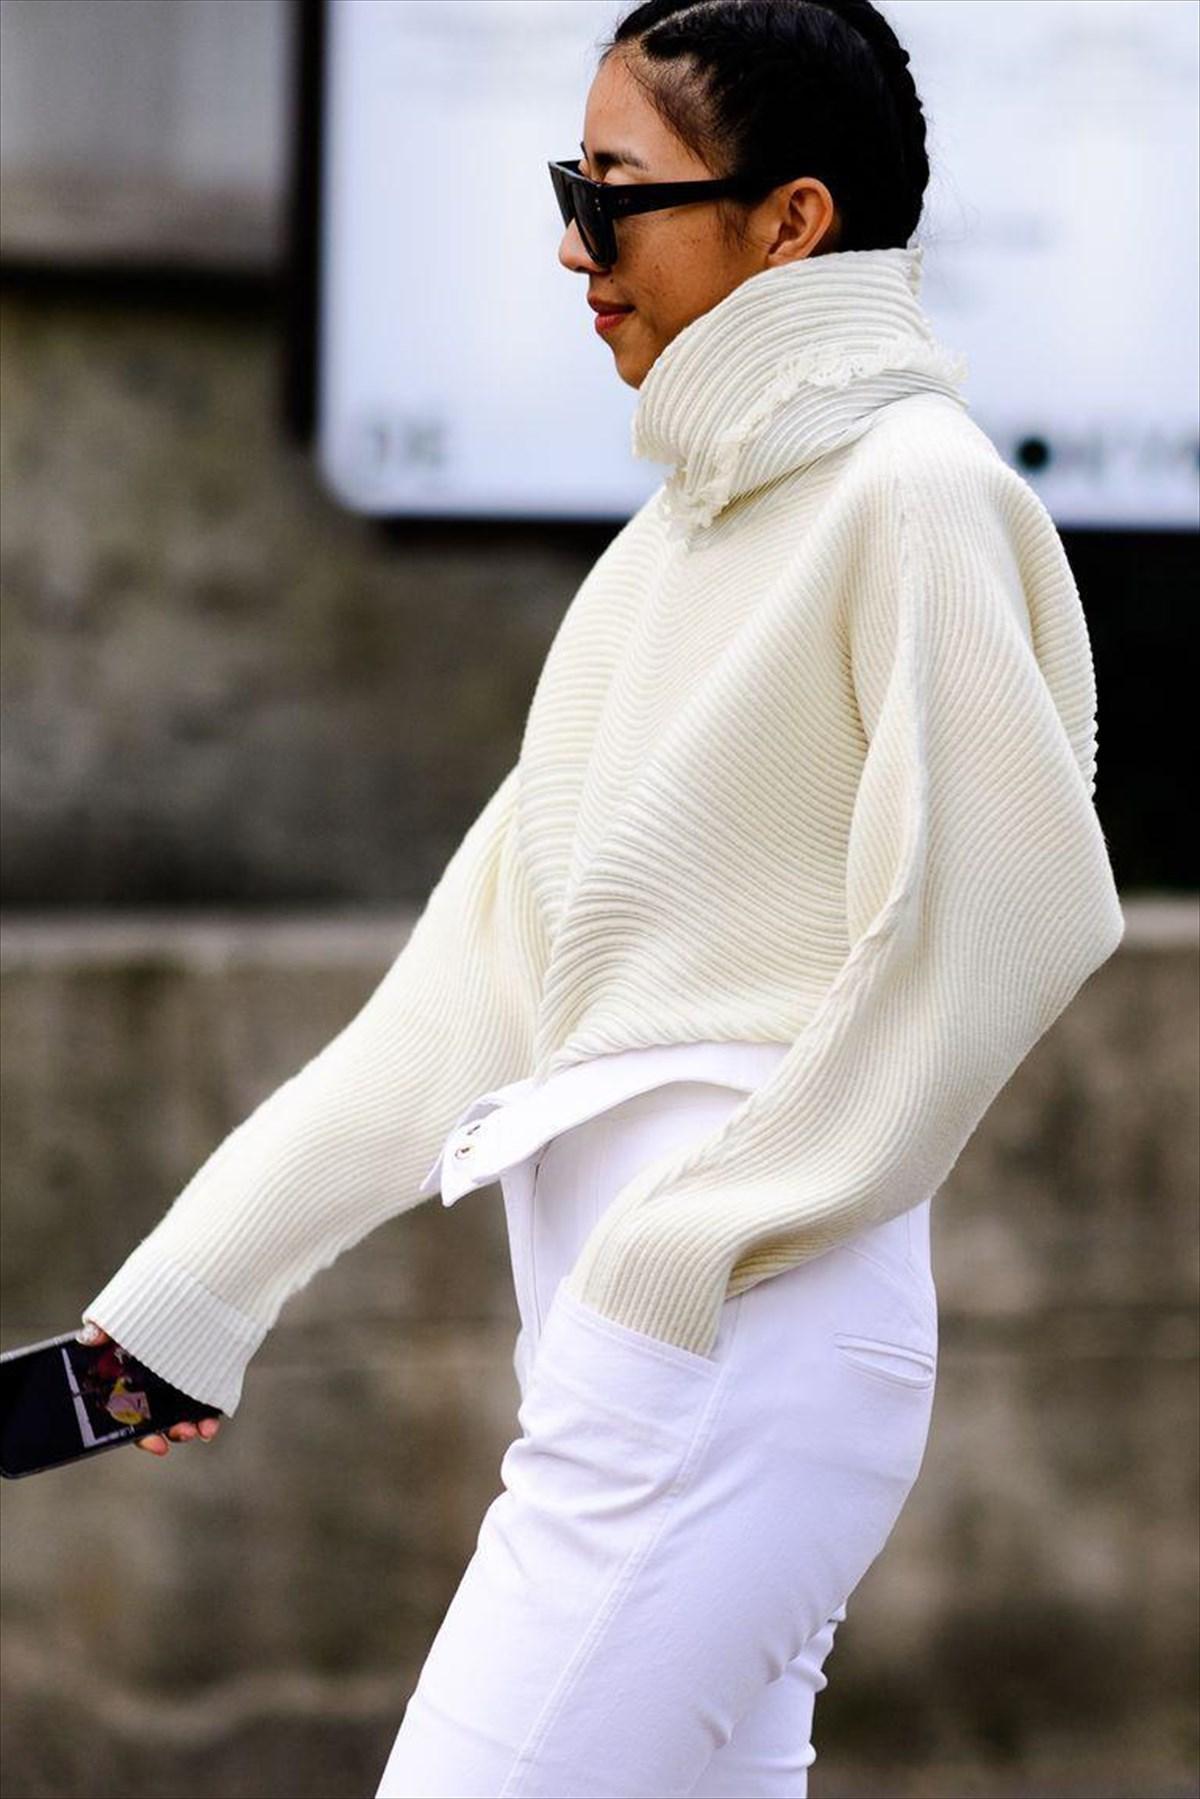 330396e9ca96 Πώς φοράμε λευκό τον χειμώνα και στις γιορτές